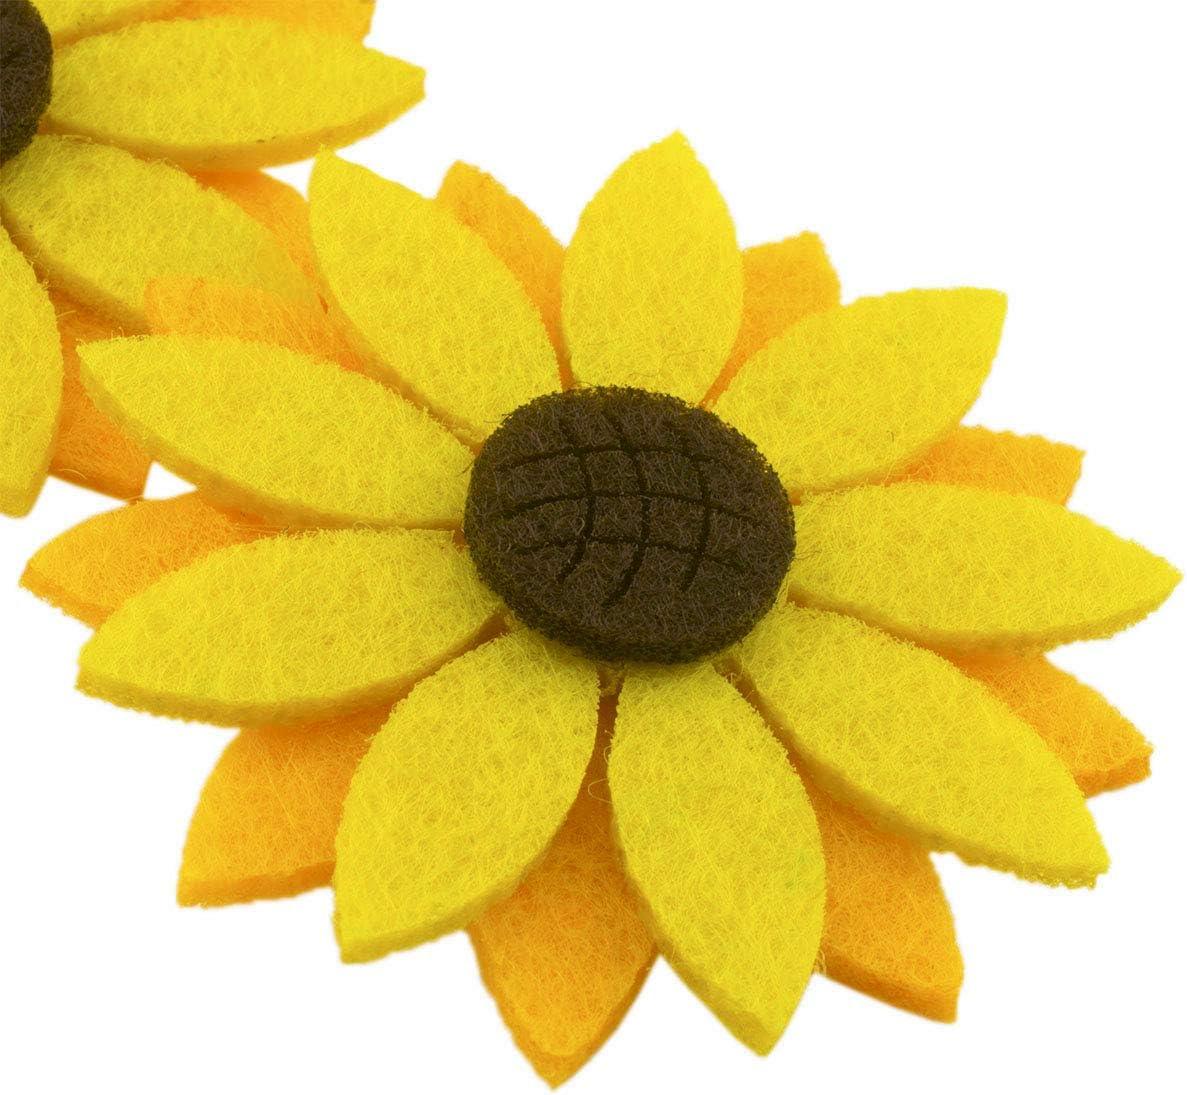 Die Cut Floral Craft Embellishments pack of 8 Triple Layered Felt Flowers